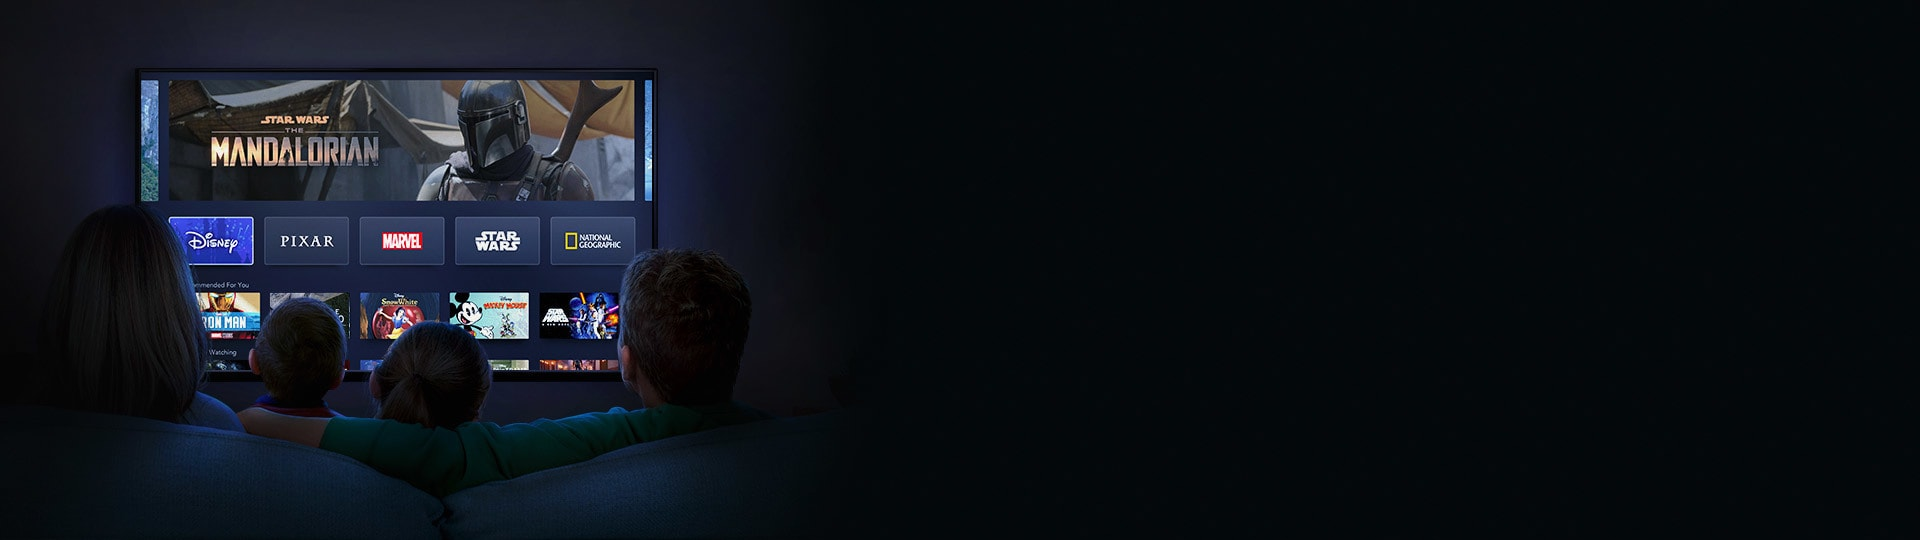 AU - ContentBanner - DisneyPlus - homepage - FamilyLineup